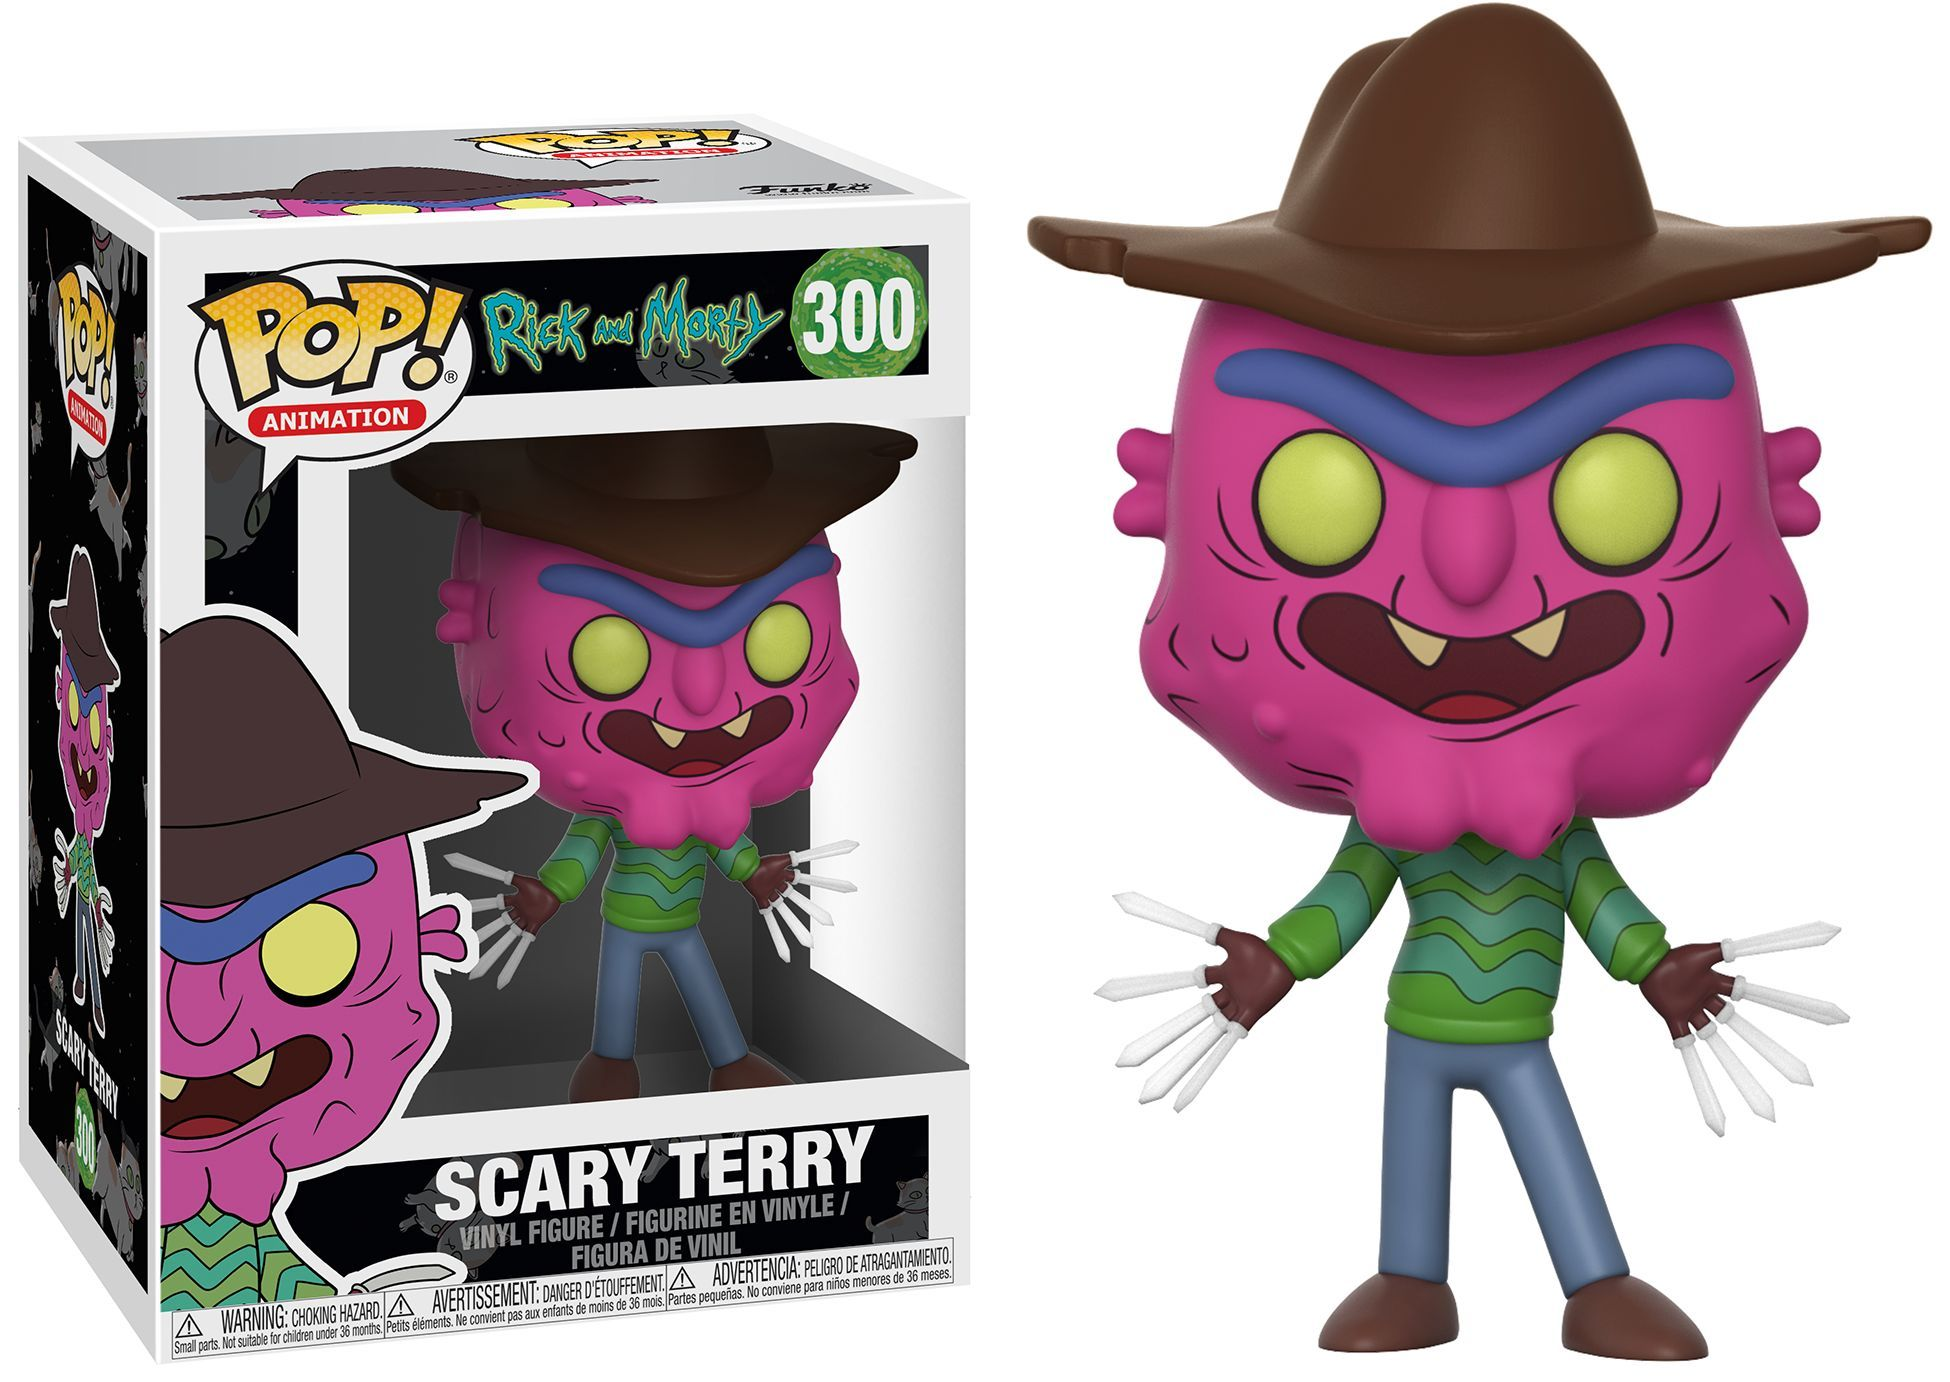 Фигура Funko Pop! Animation: Rick  Morty Series 3 - Scary Terry, #300 - 2